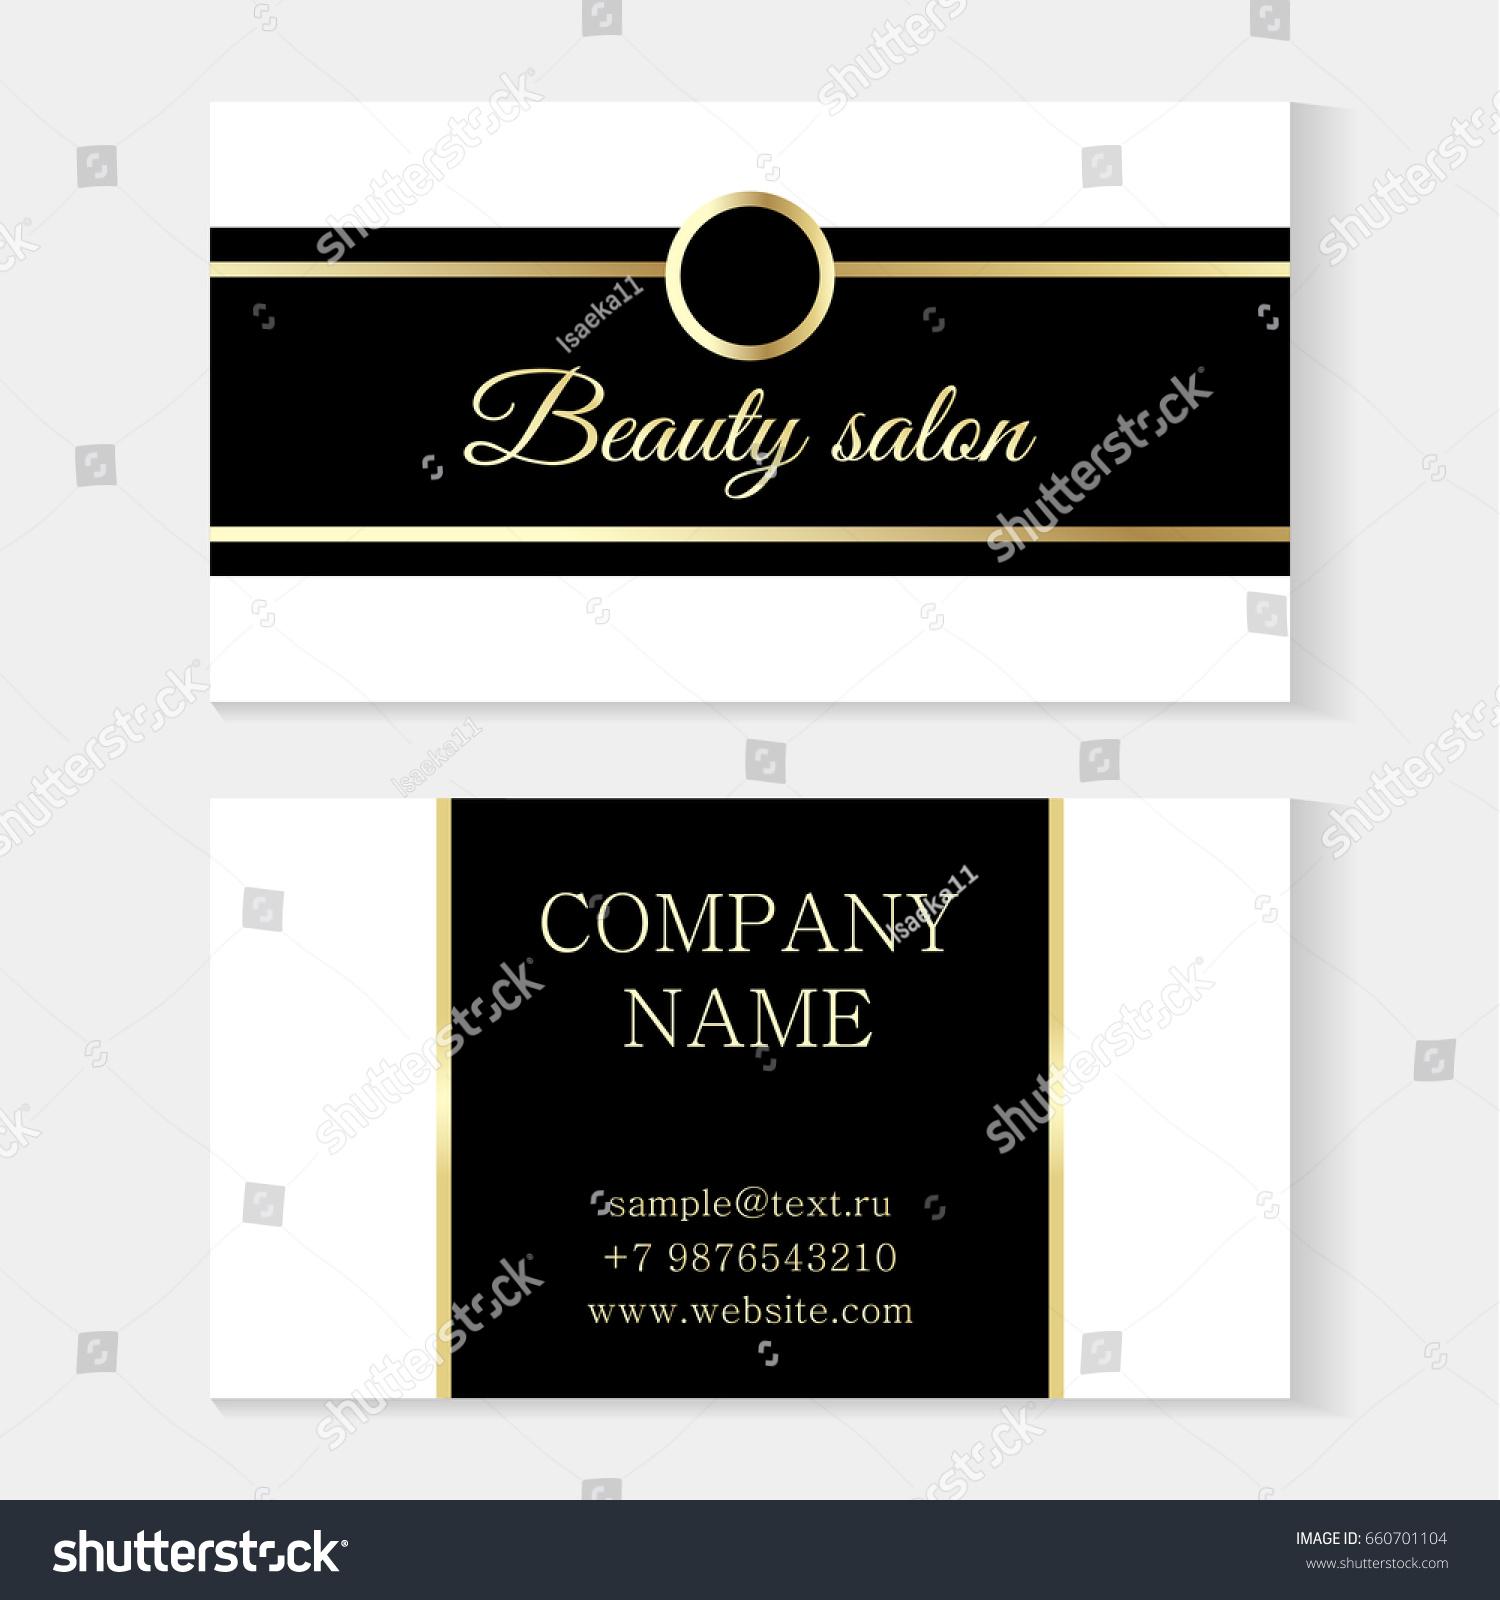 Stylish Beauty Salon Template Business Card Stock Vector 660701104 ...